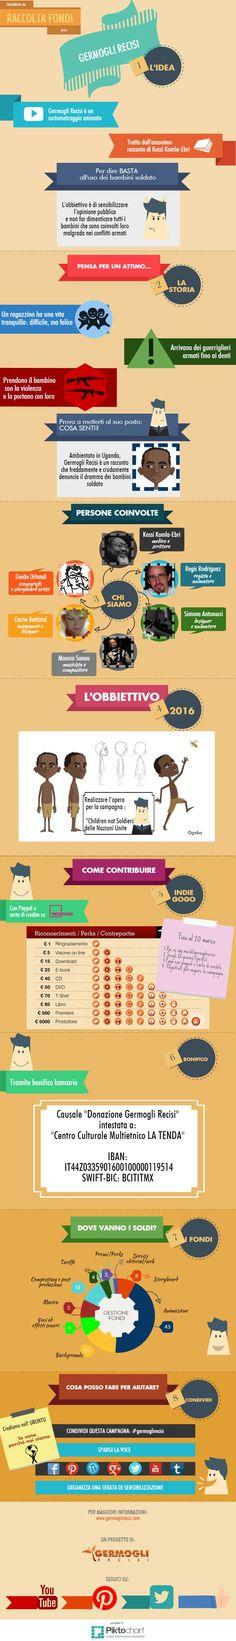 GermogliRecisi | Piktochart Infographic Editor Infographic, Editor, English, Graphic Design, Infographics, English Language, Visual Communication, Visual Schedules